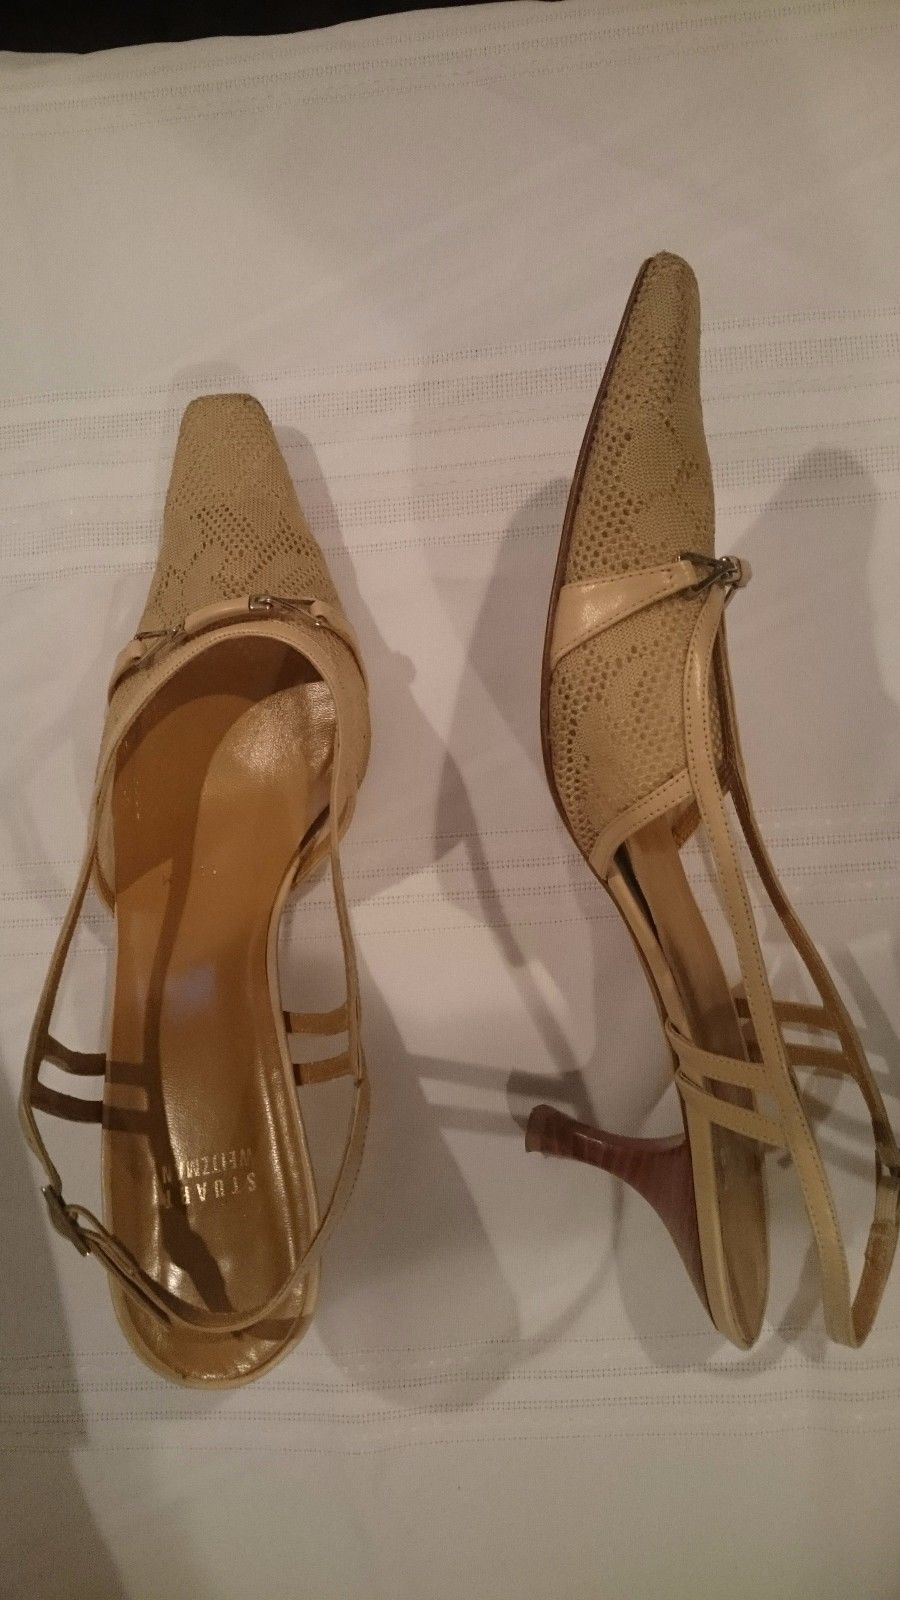 Stuart Weitzman Damens's Schuhes – Hampton Beige Deco Mesh ... Größe 11 ... Mesh d097b1